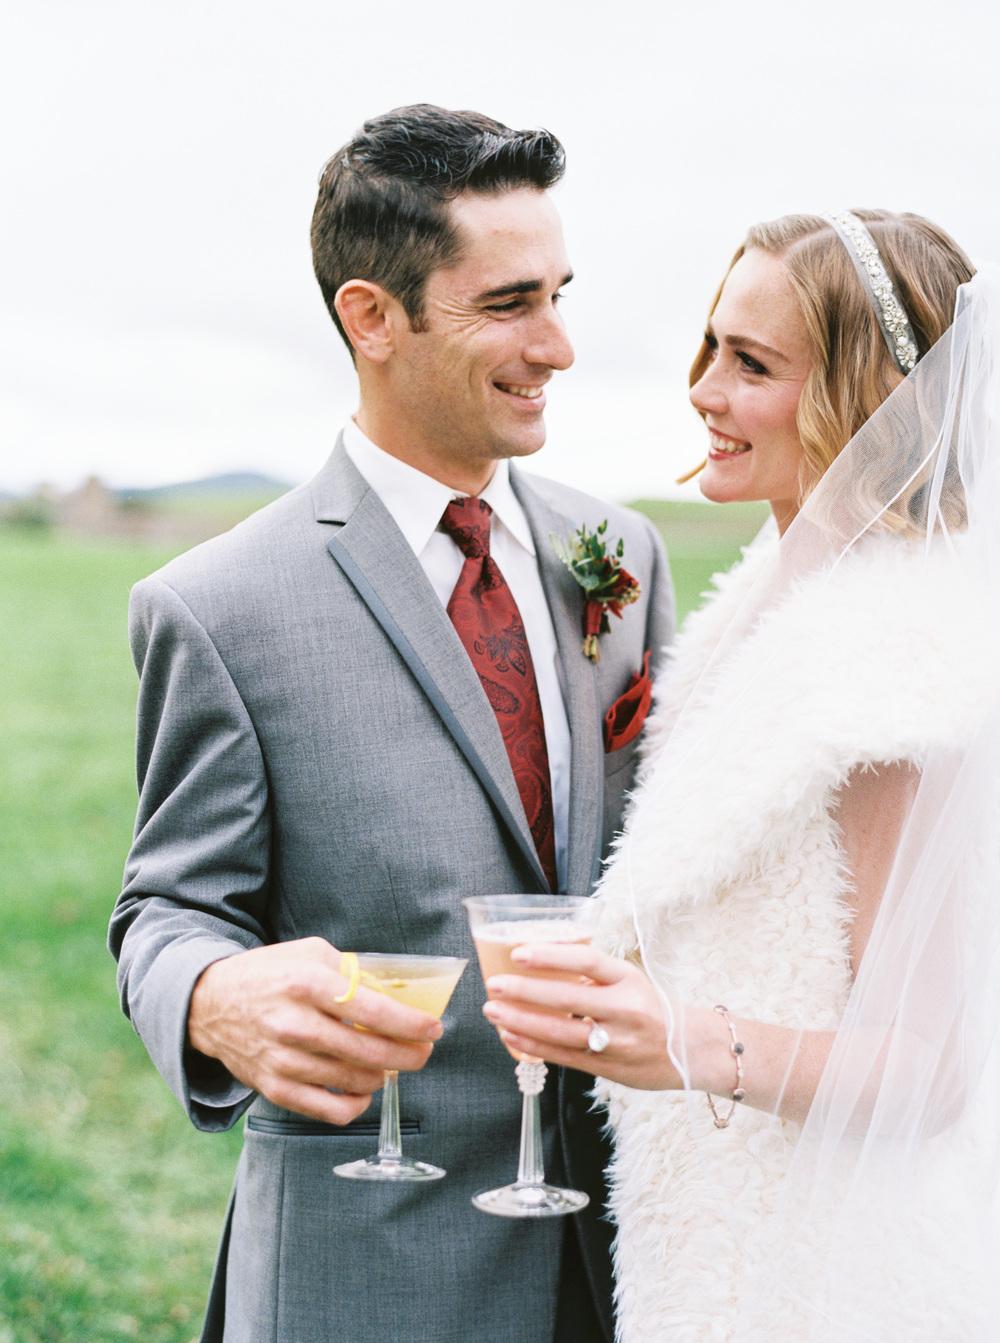 Bride and Groom Cocktails.jpg